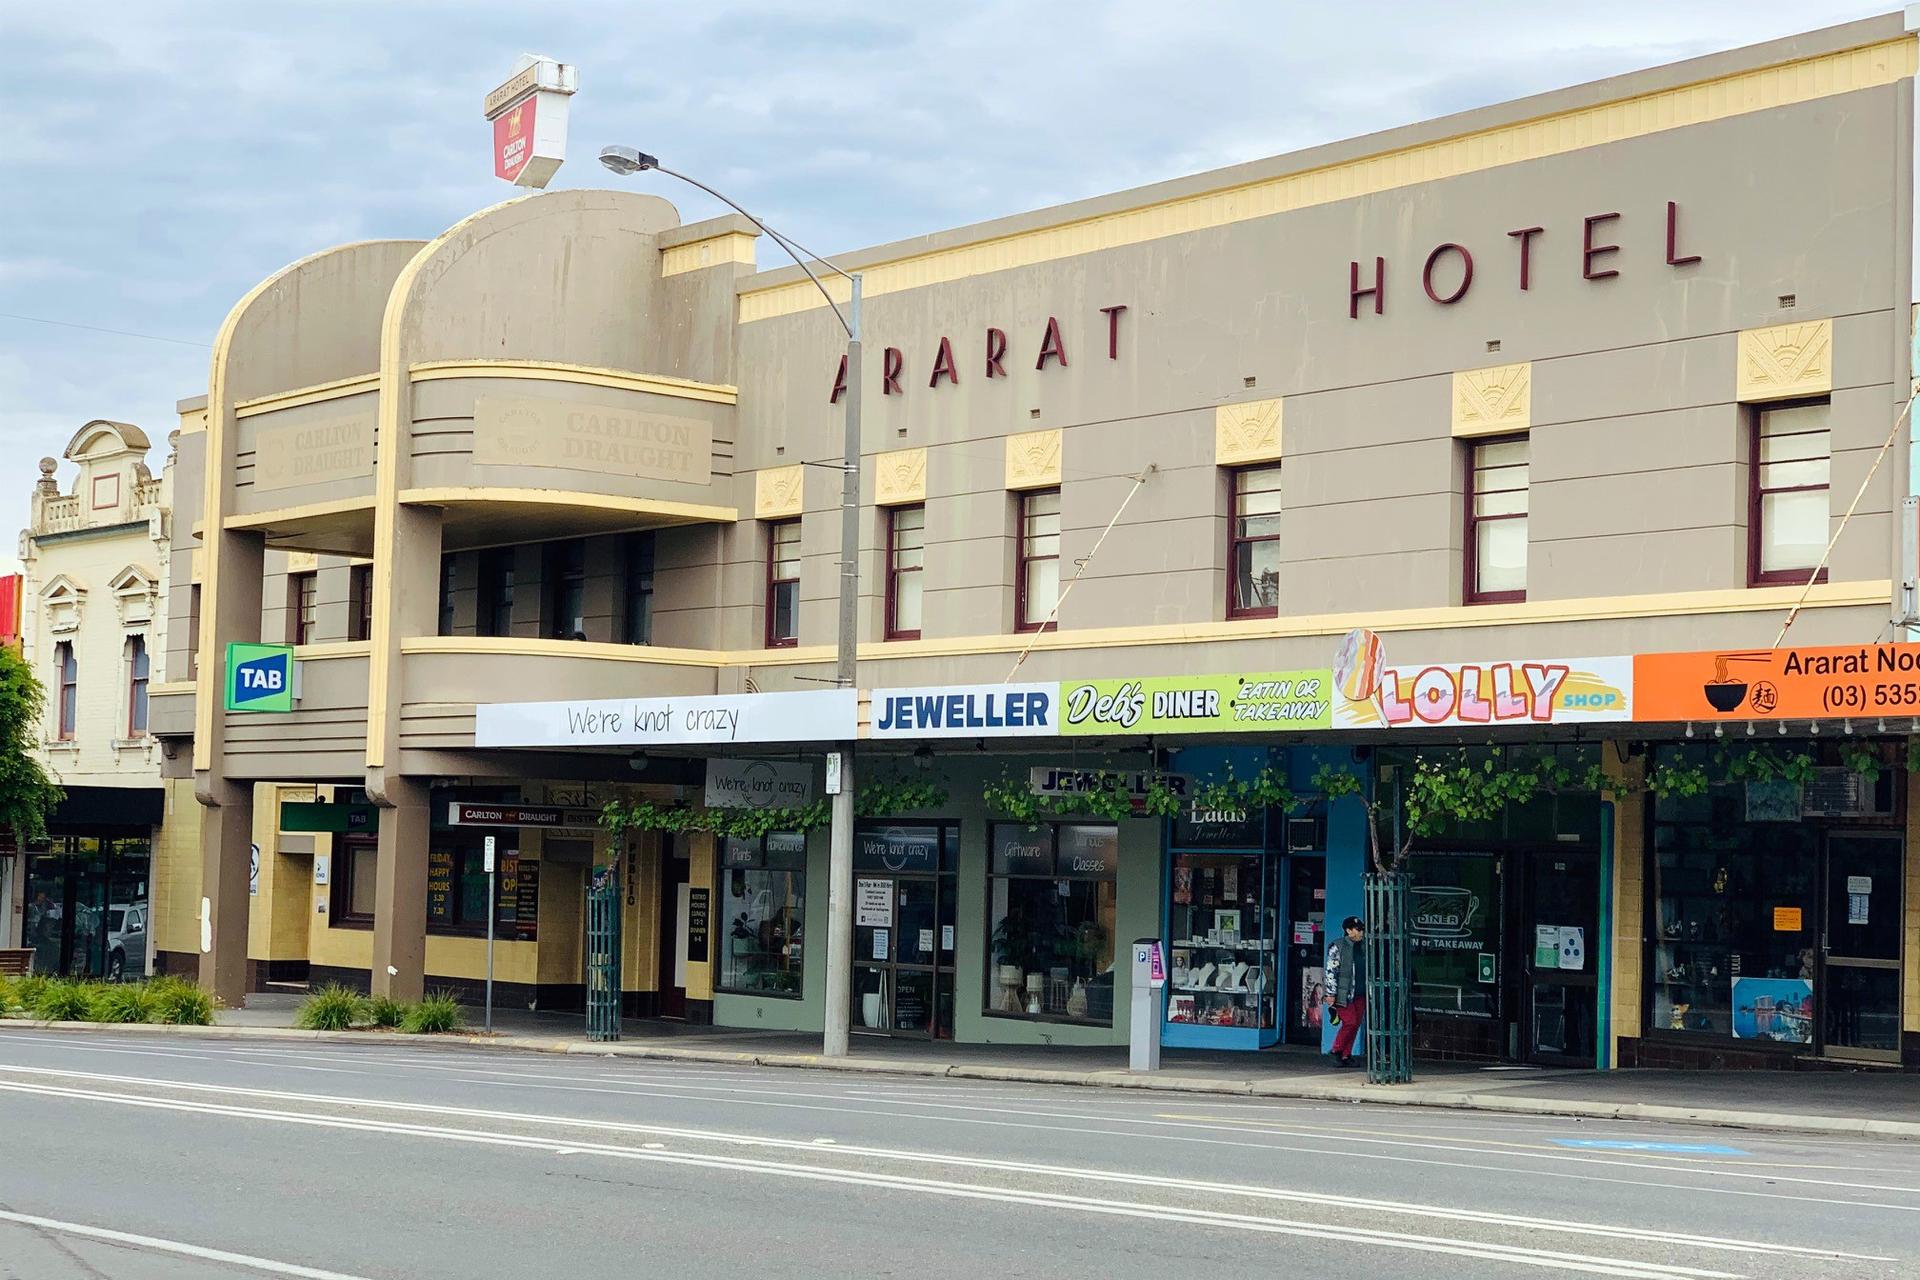 g - Ararat Hotel